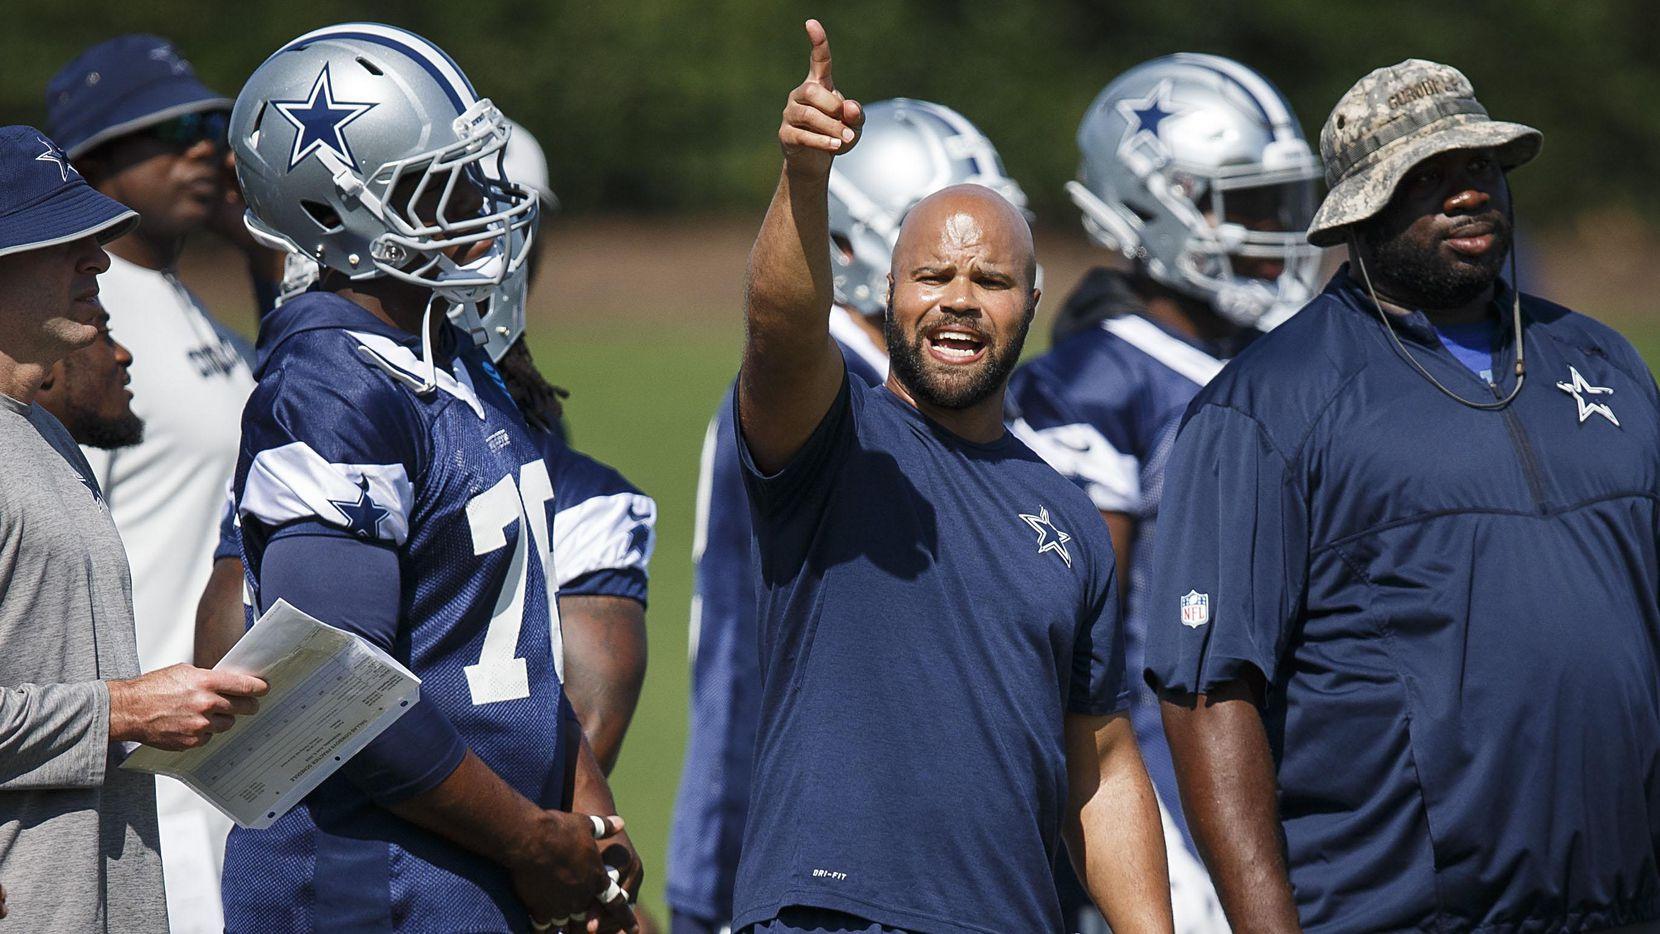 Kris Richard reemplaza a Joe Baker como coach de la secundaria de los Cowboys. (DMN/Smiley N. Pool)